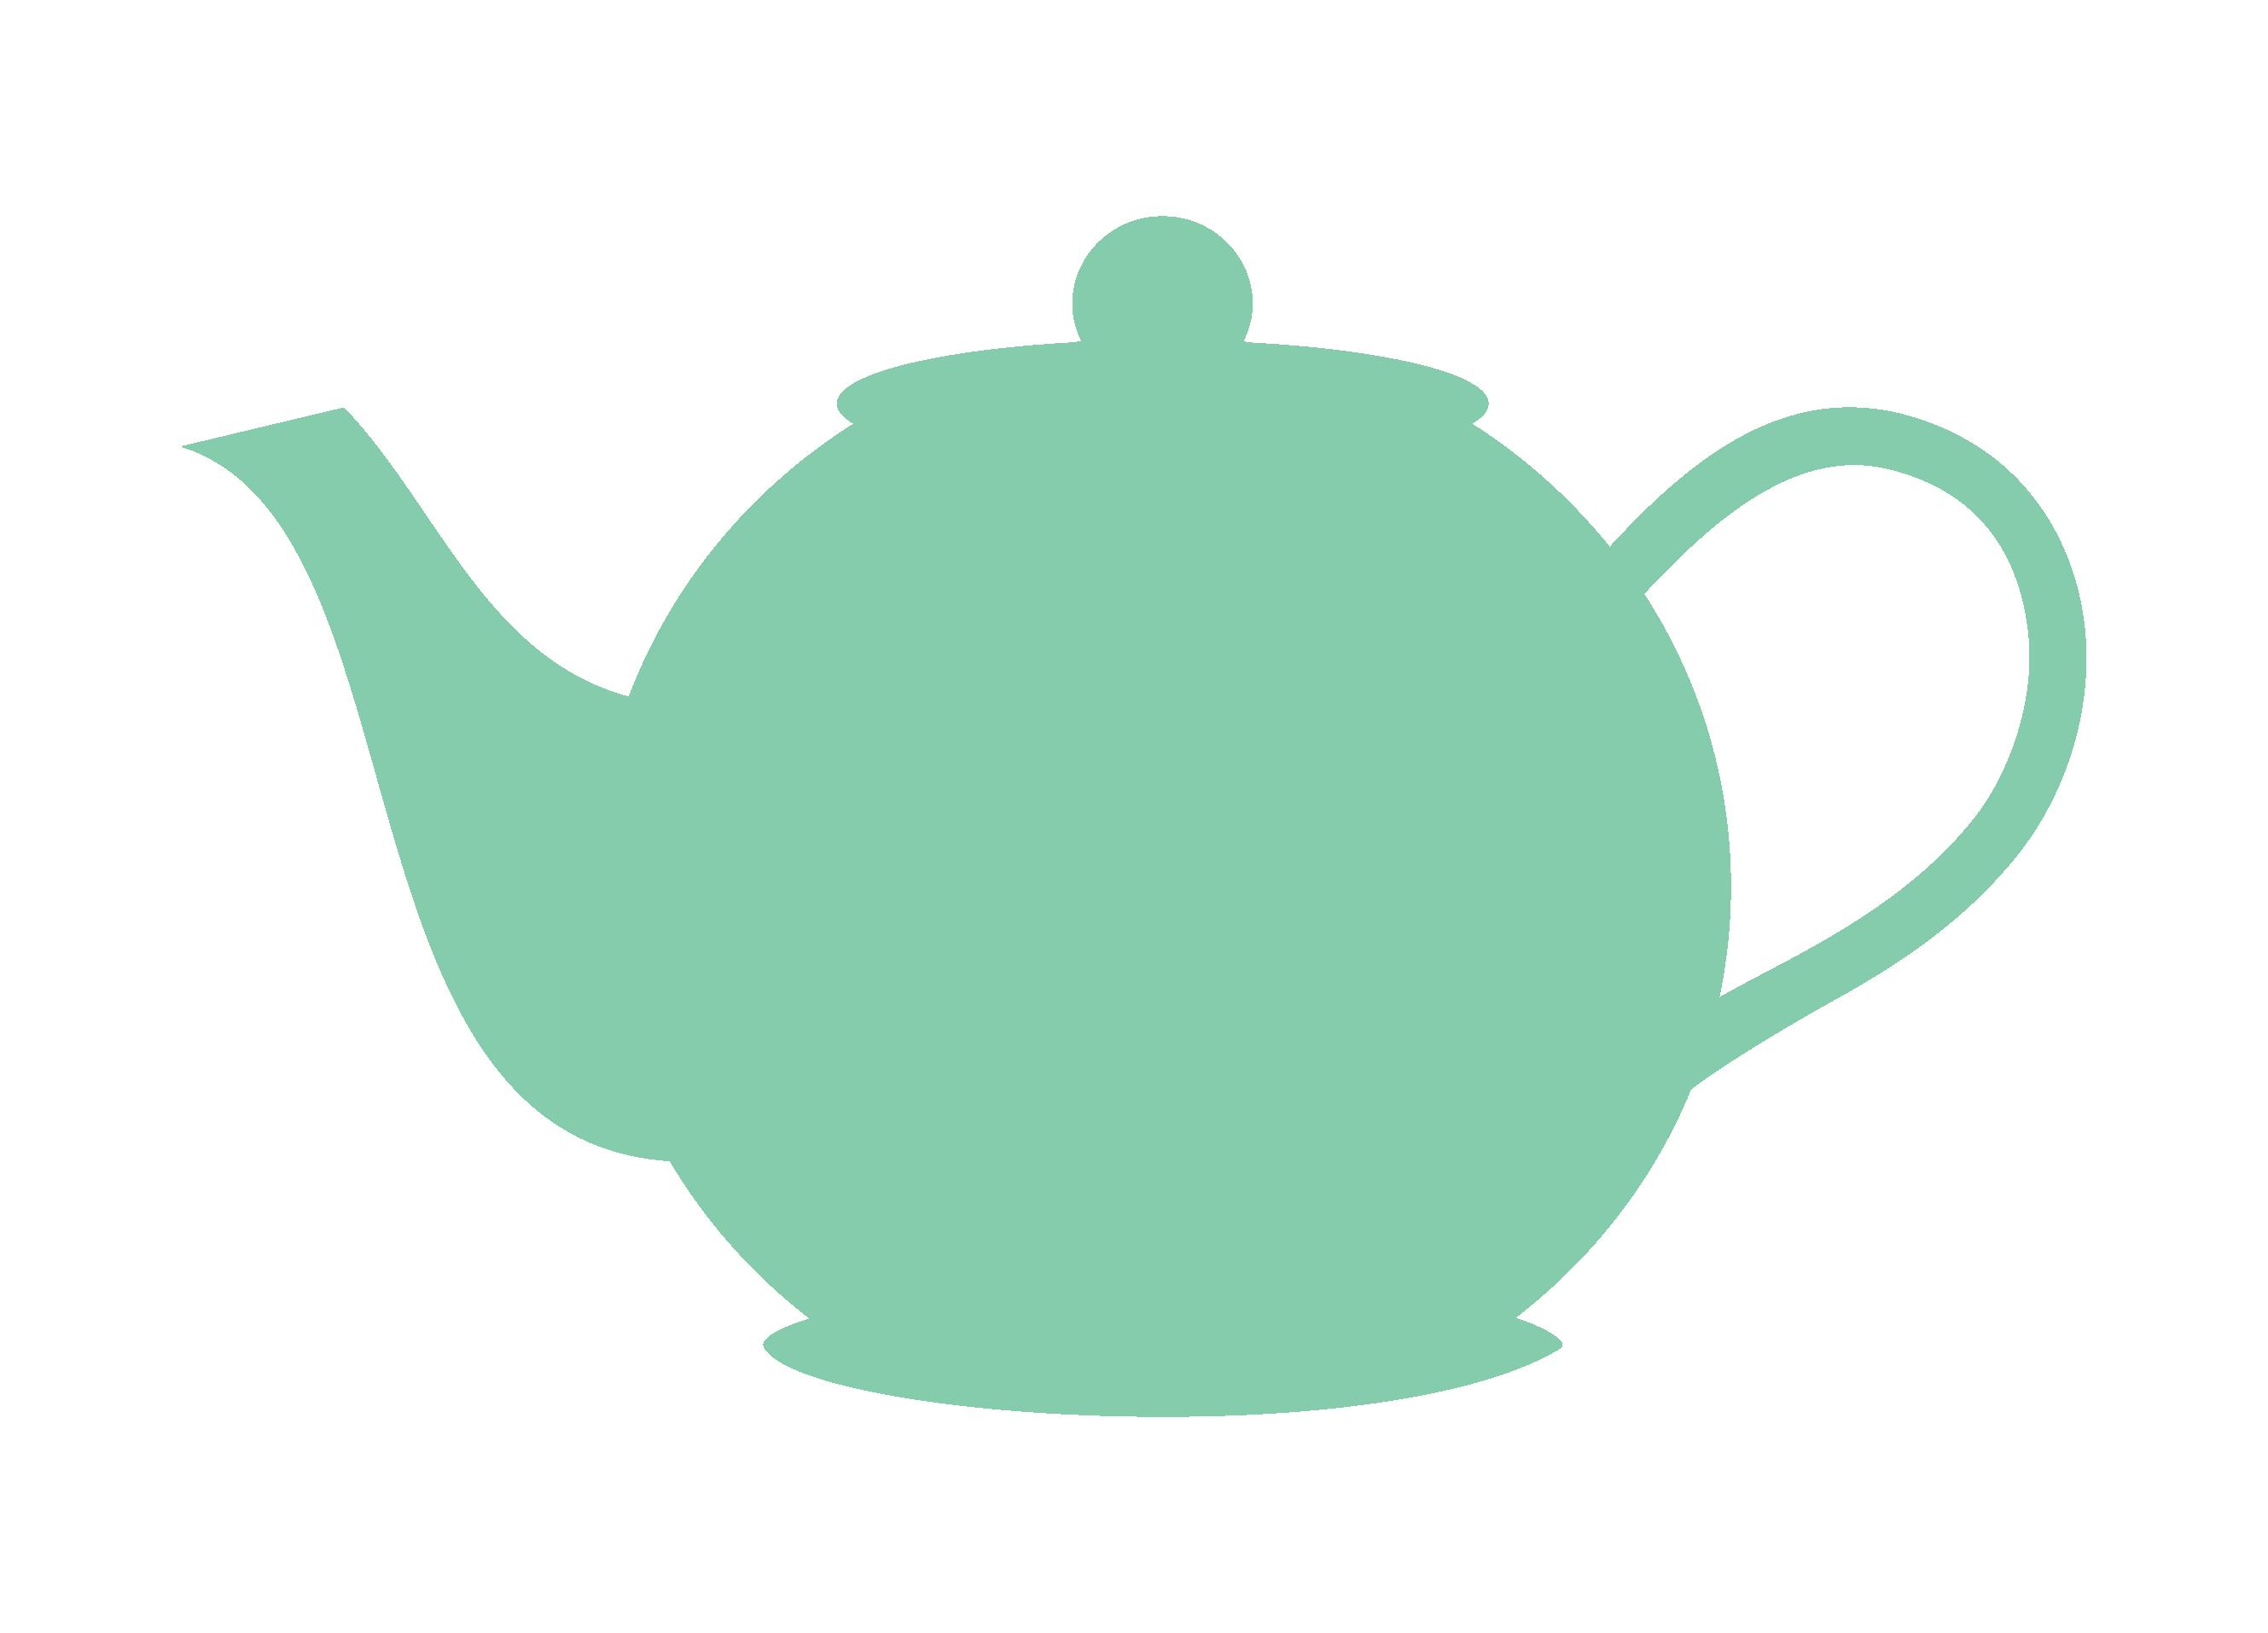 Christmas tea clipart svg free library tea pot | teapot-clipart-cc-kitchen-utensils-clip-art-teapot.png ... svg free library